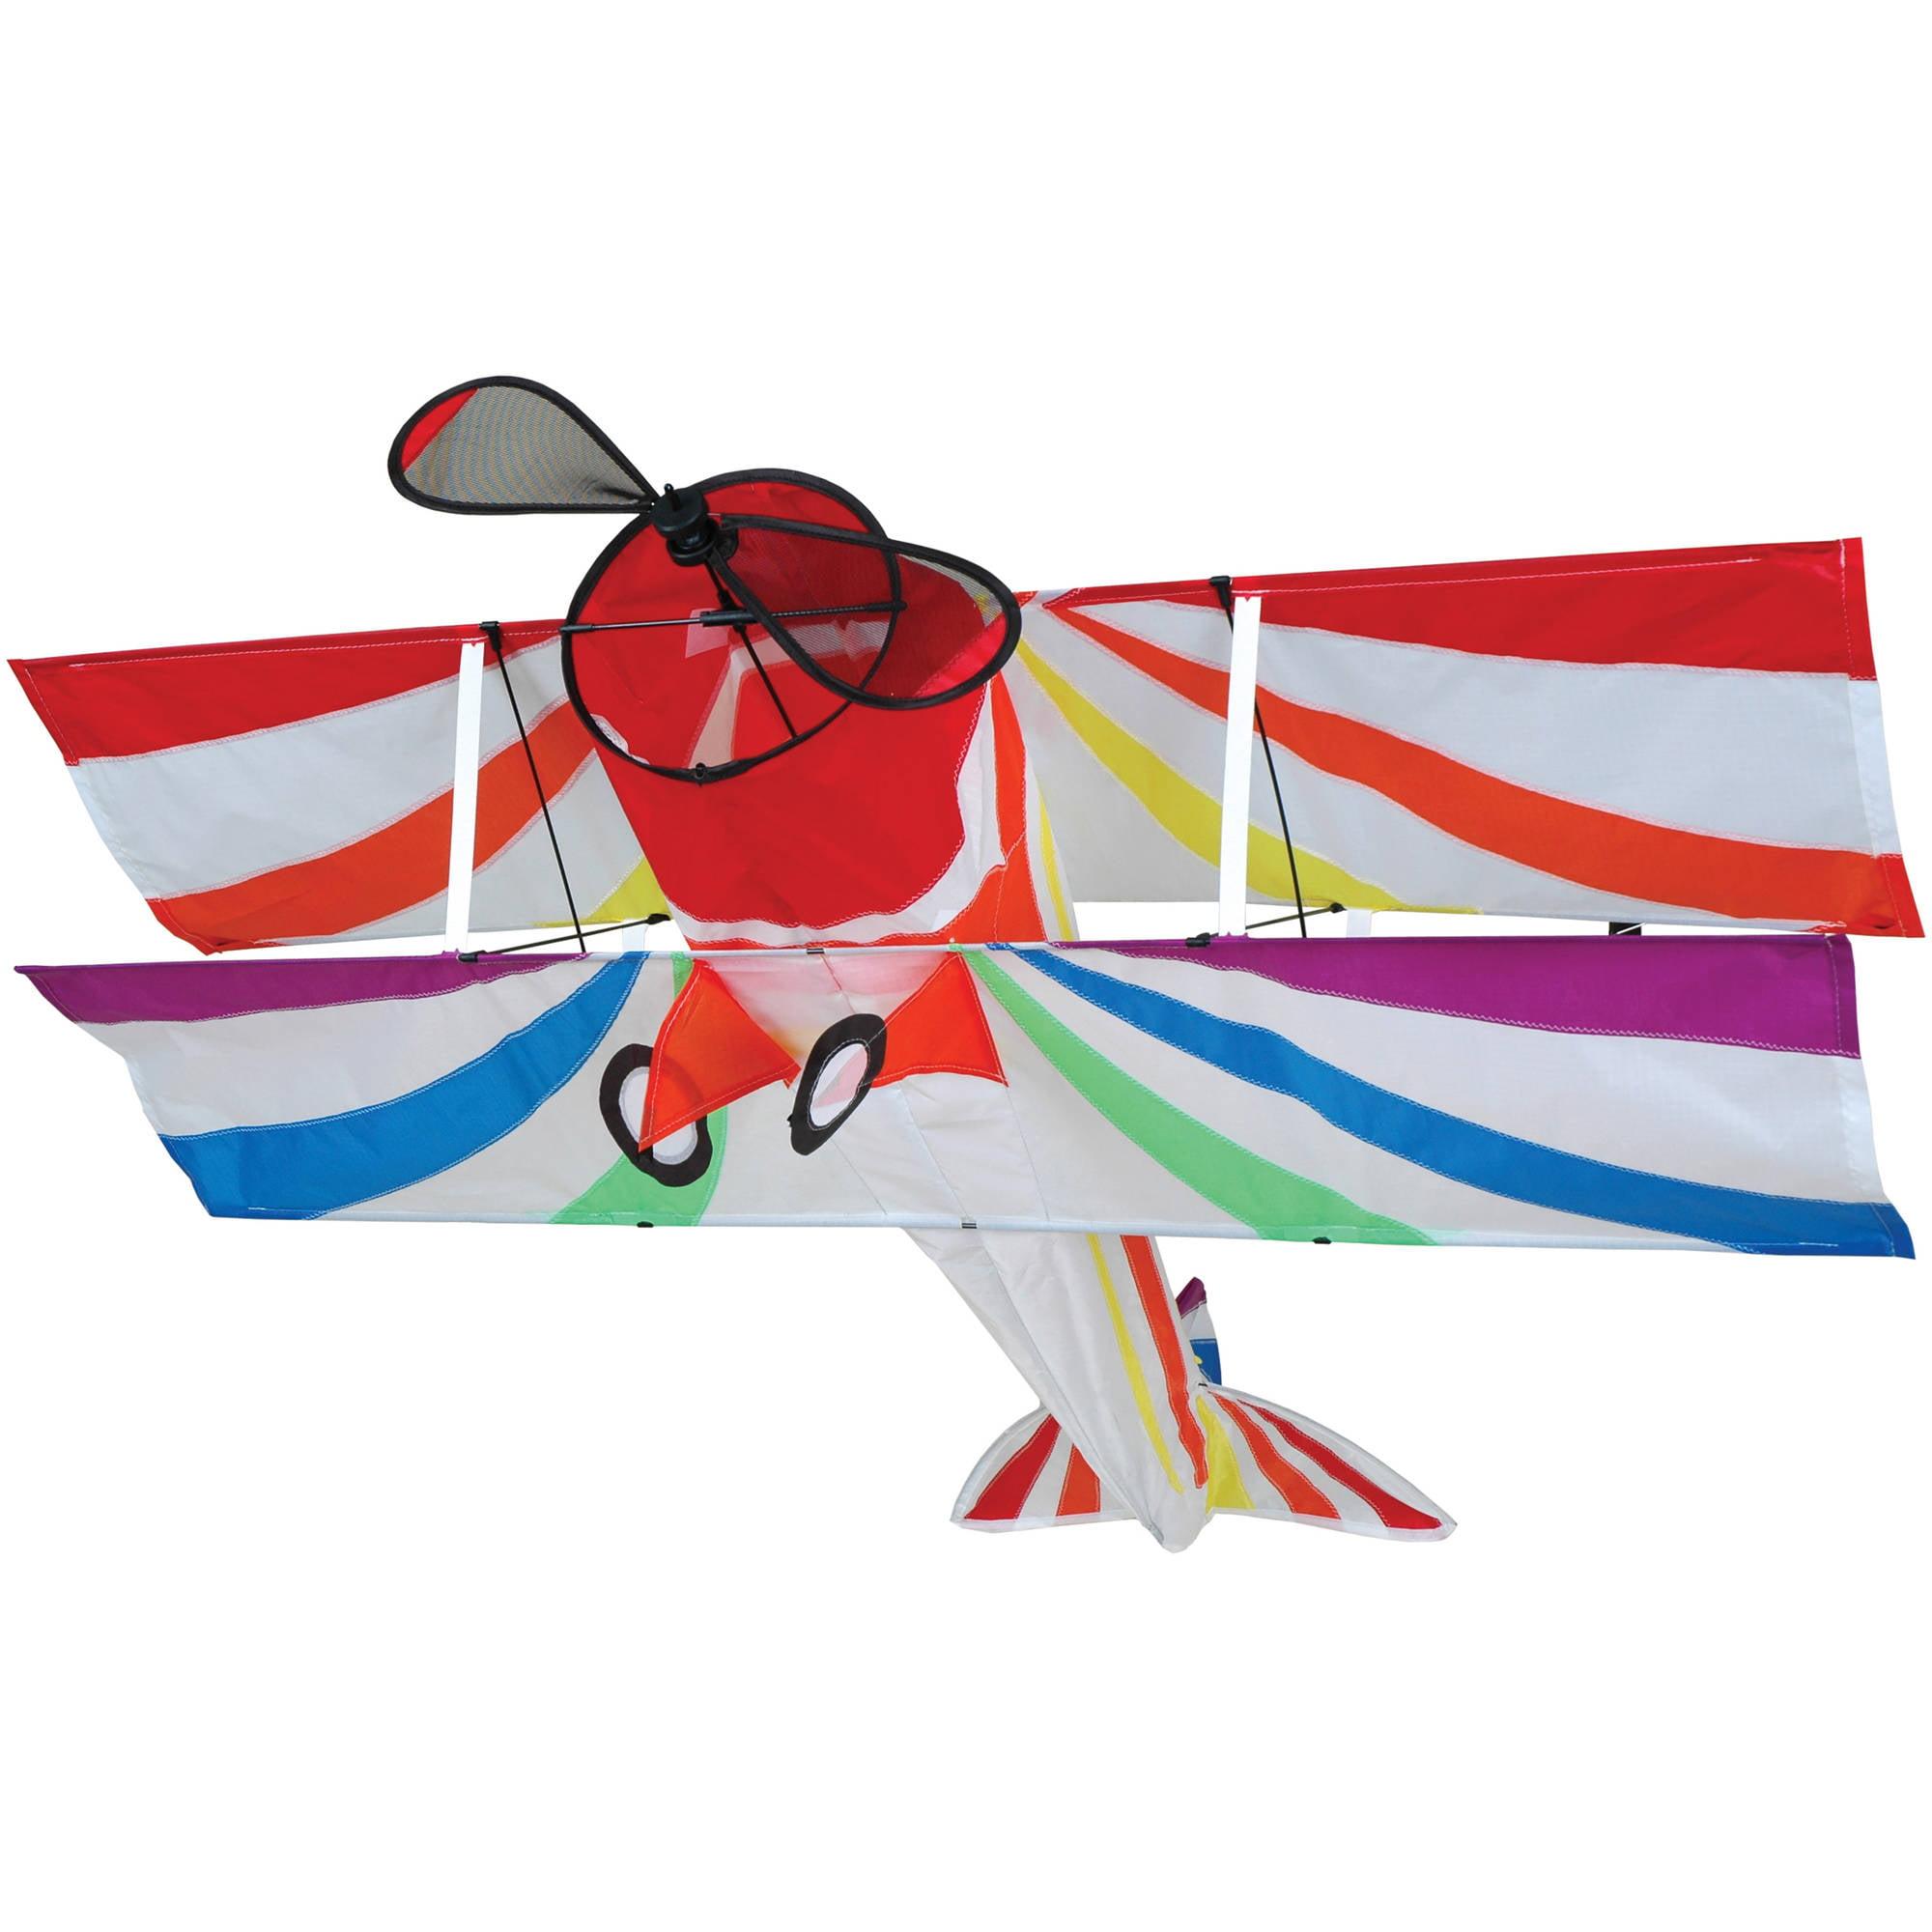 Premier Designs Rainbow Bi-Plane Kite by Premier Kite